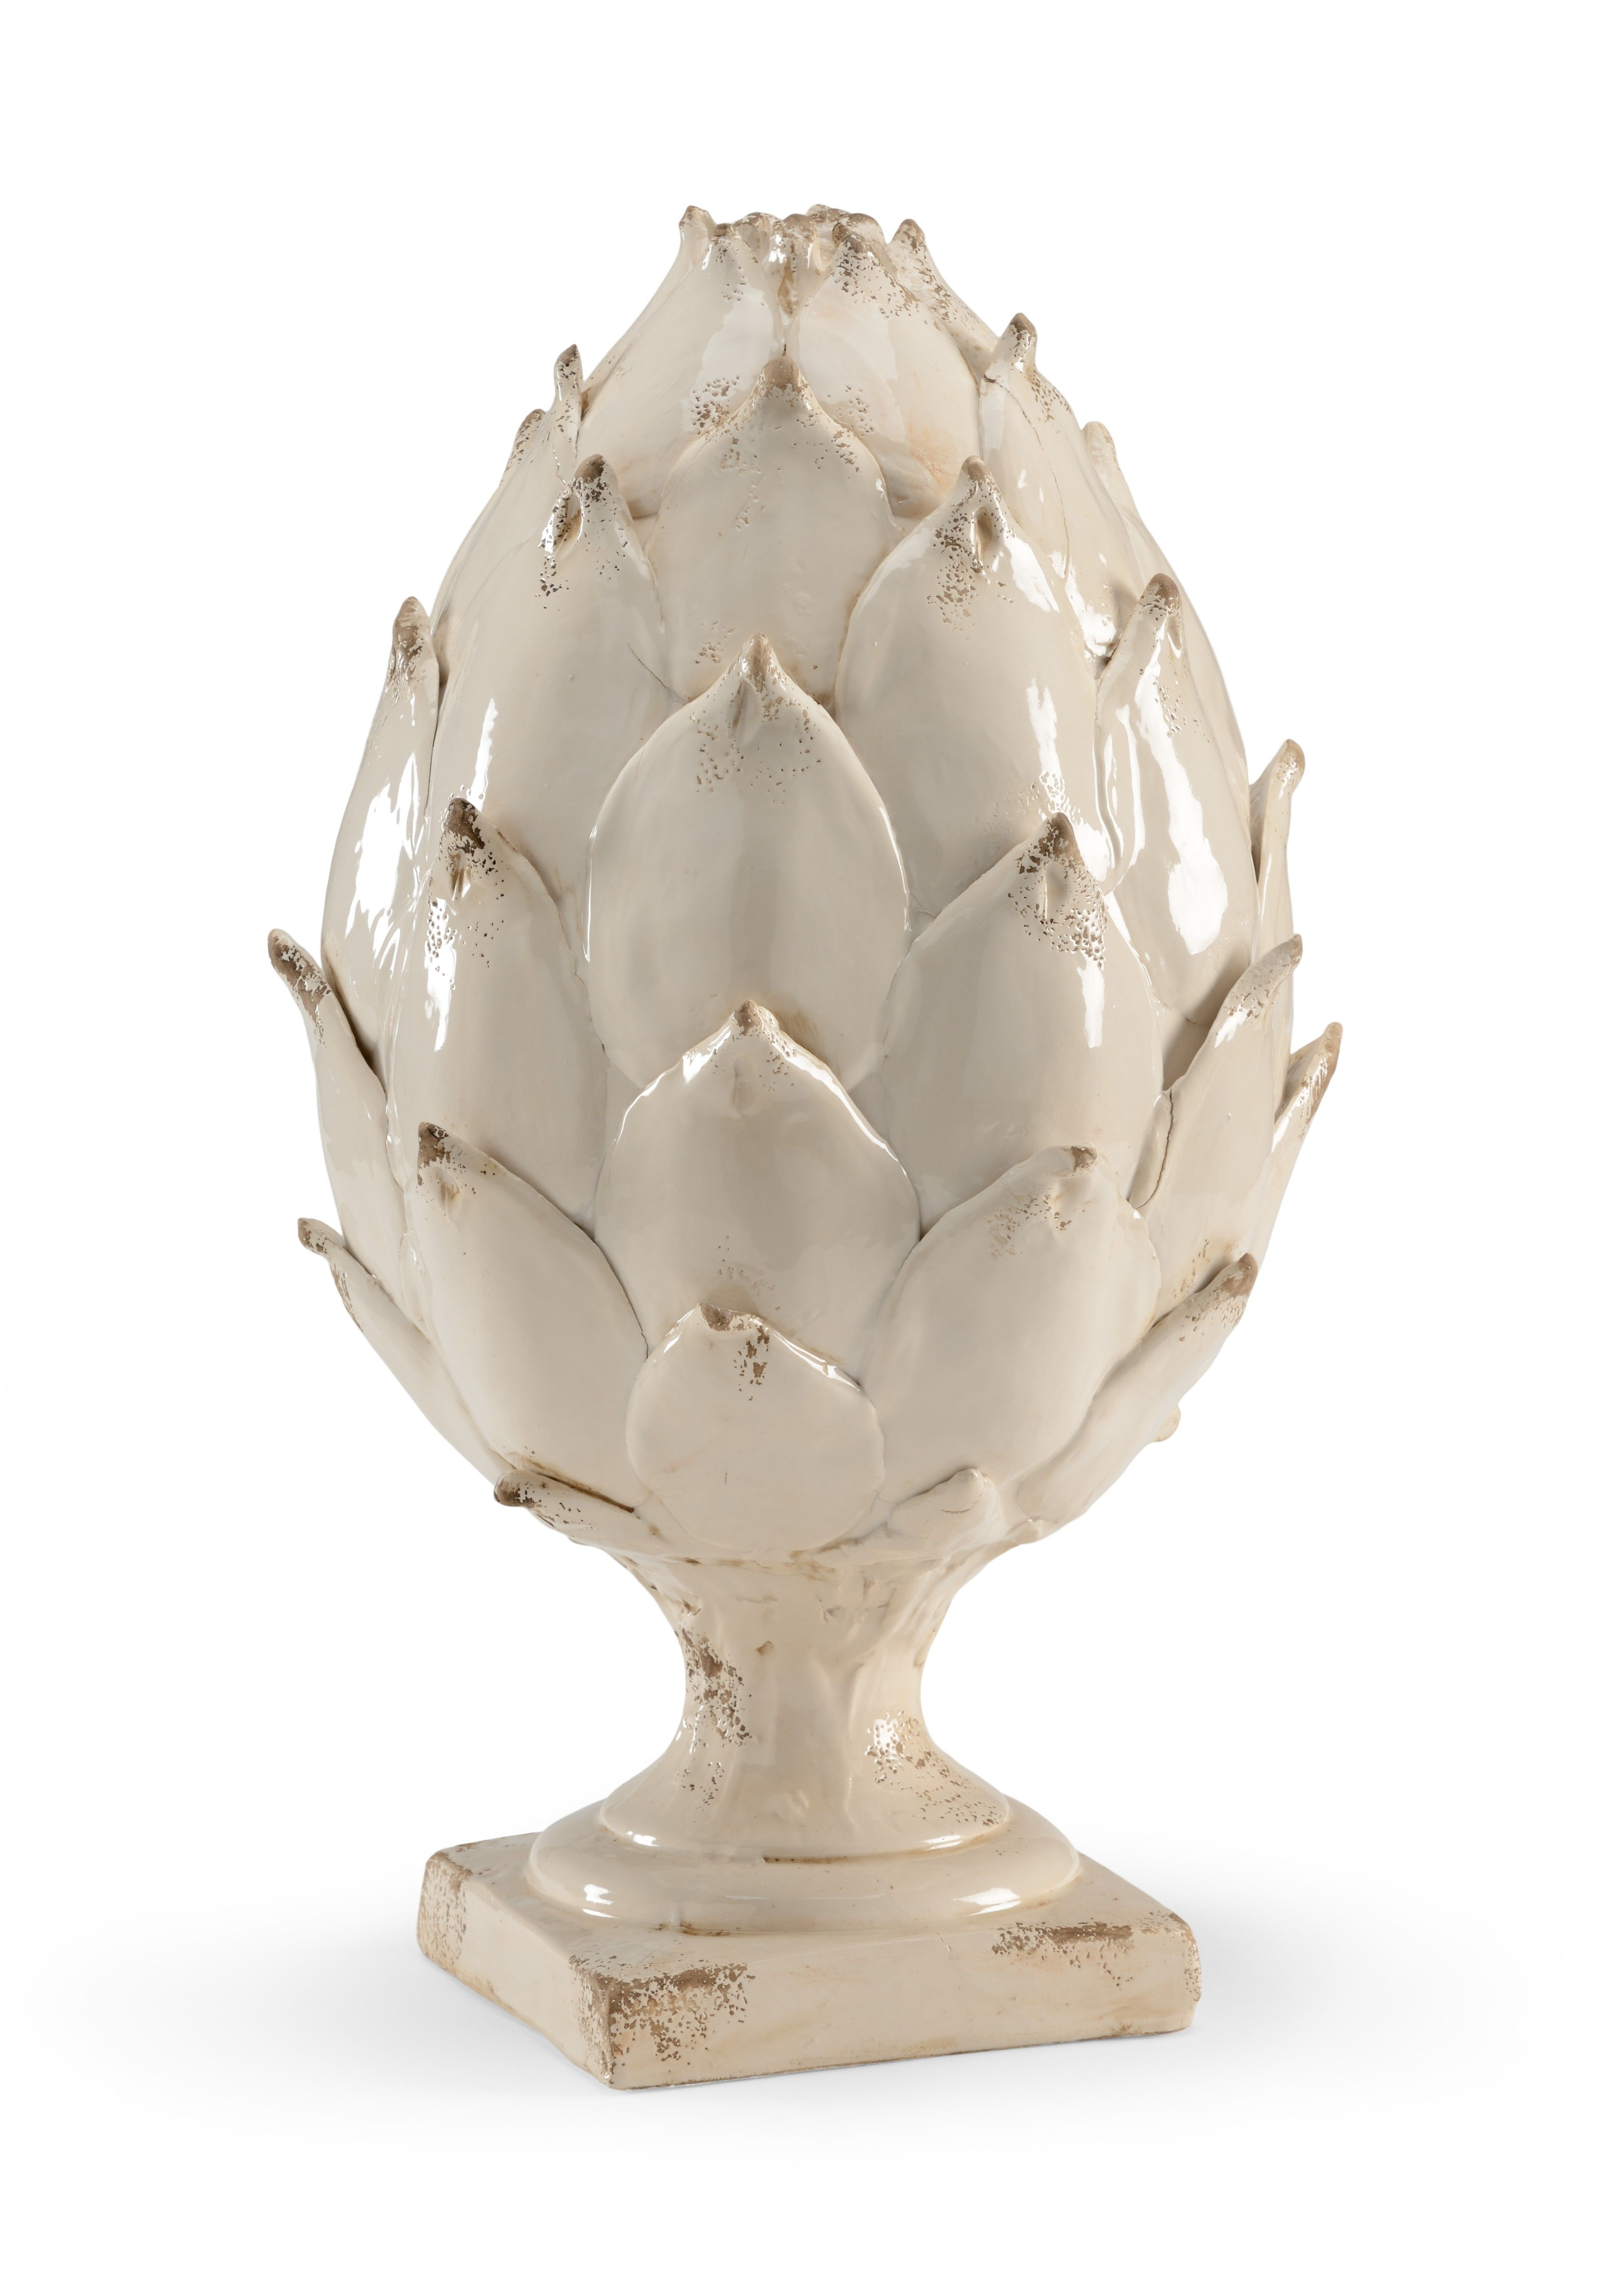 large antique white glaze ceramic artichoke statue decorate